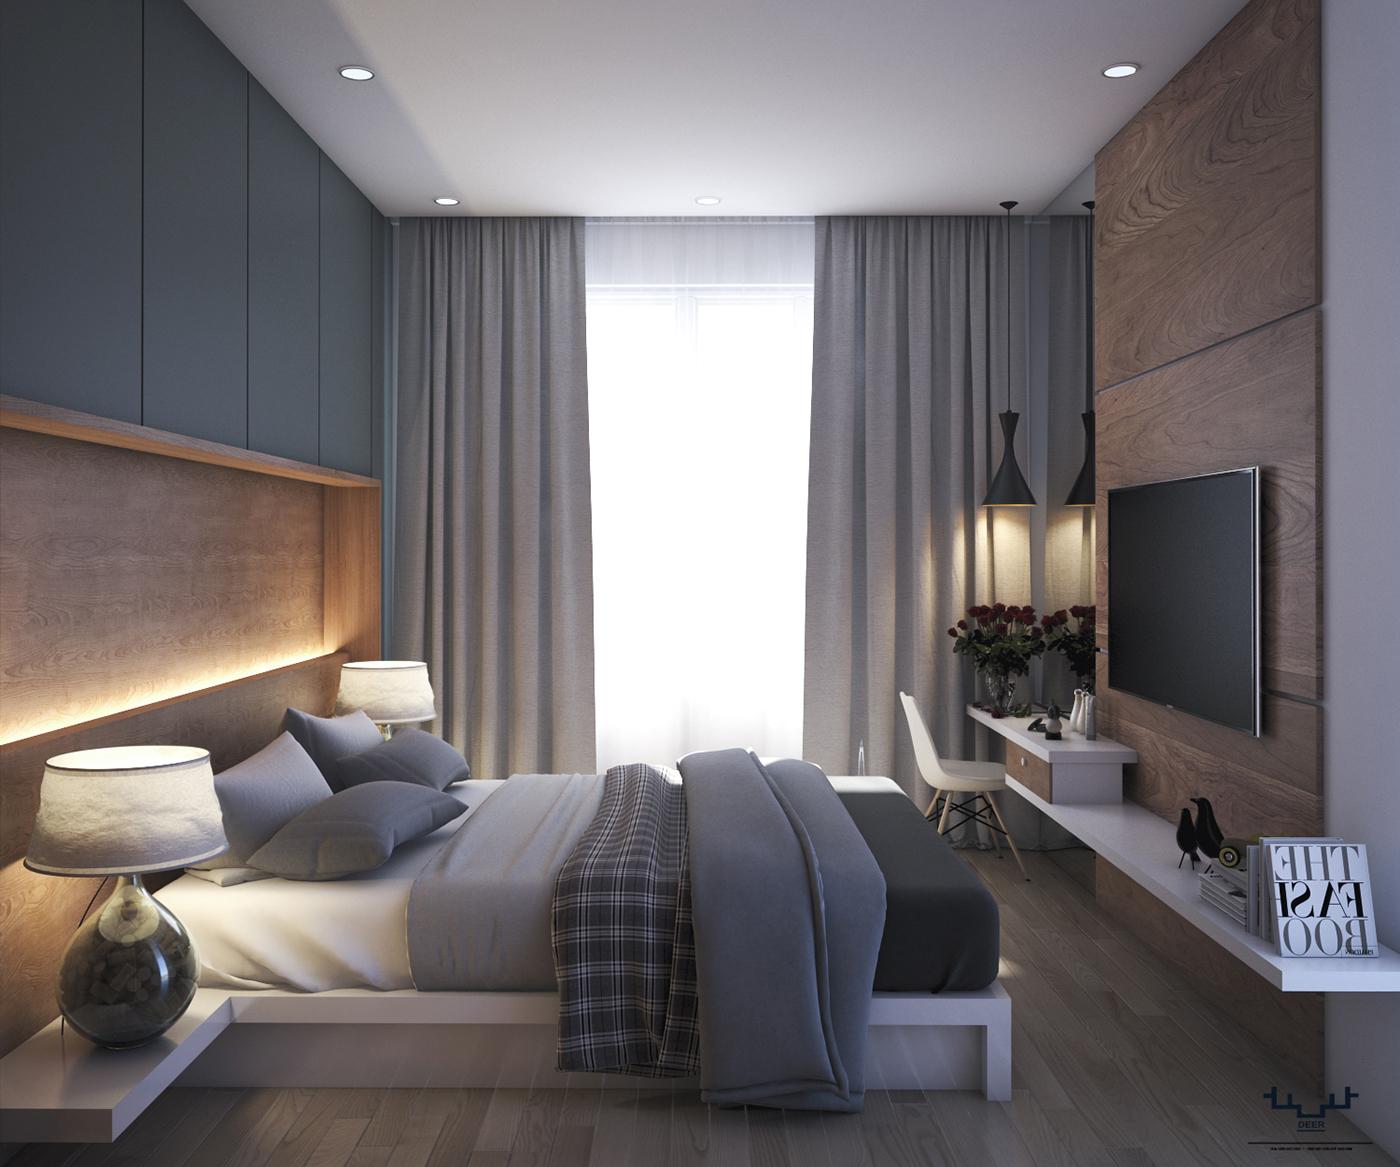 Interior Design Singapore: Scandinavian Interior Design On Behance